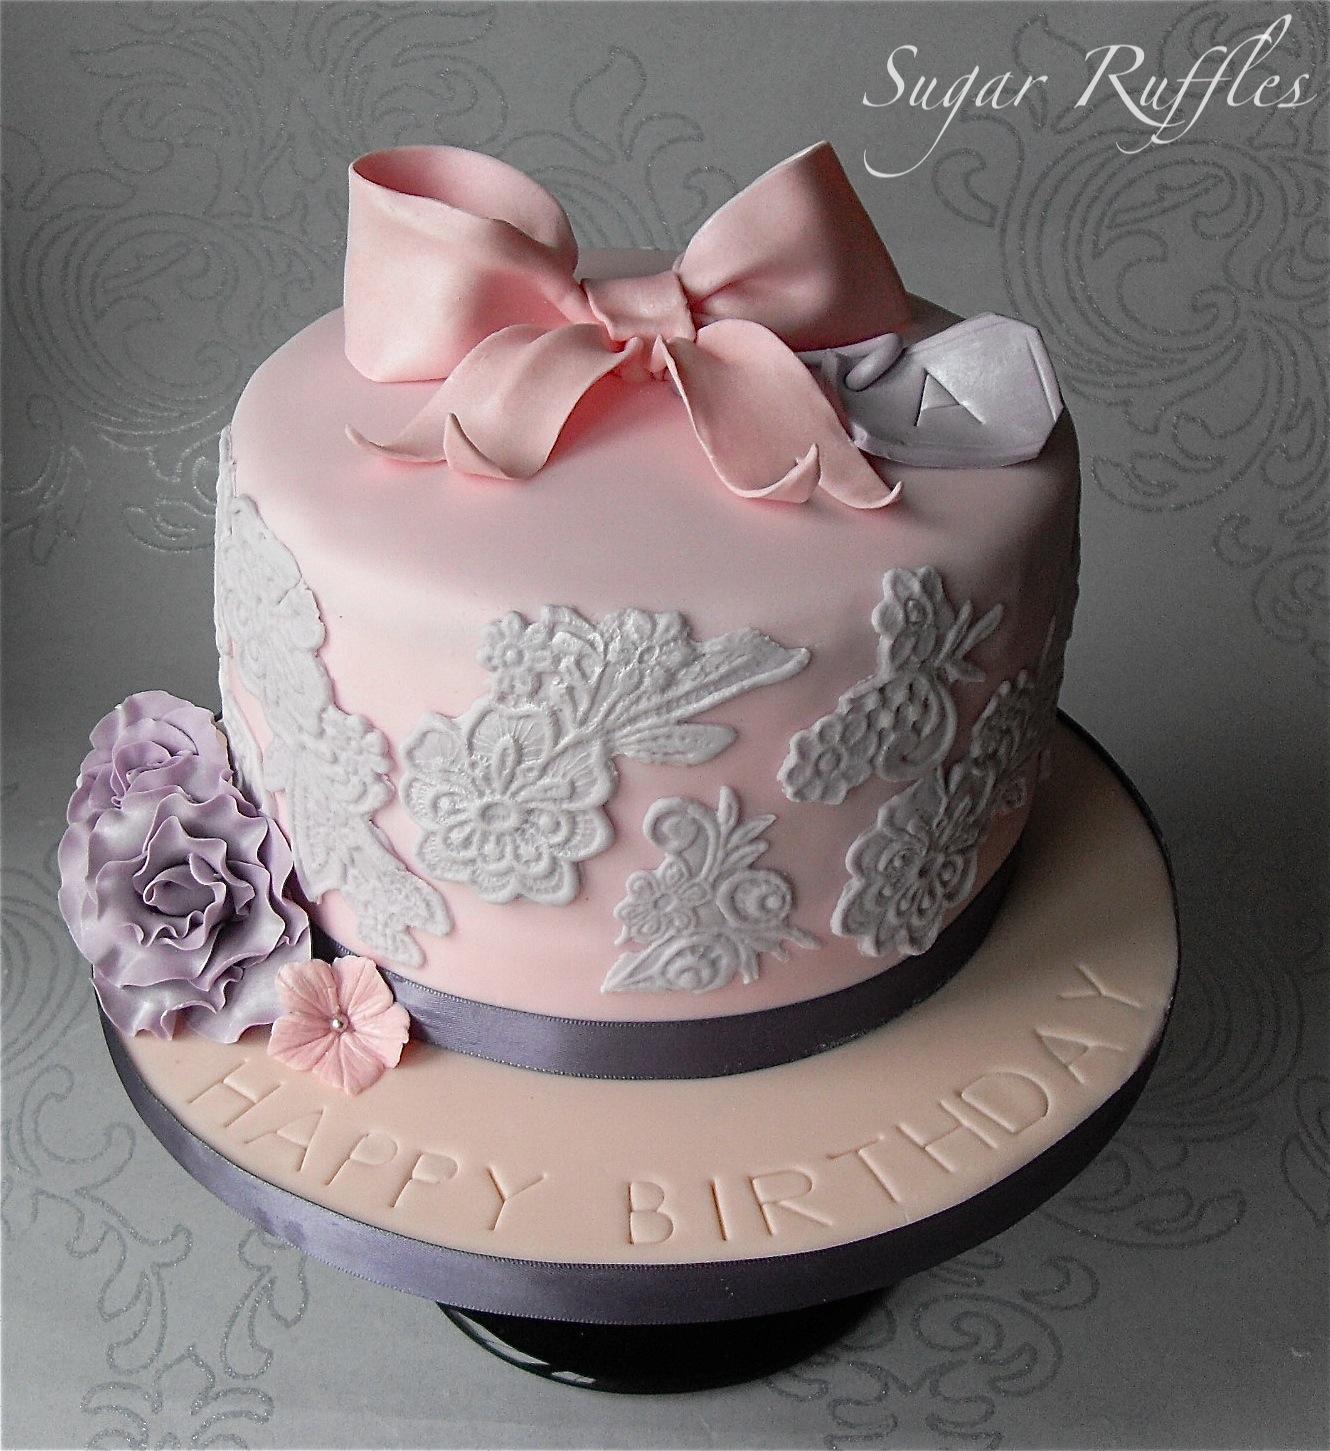 Elegant Buttercream Birthday Cakes Sugar ruffles, elegant wedding ...